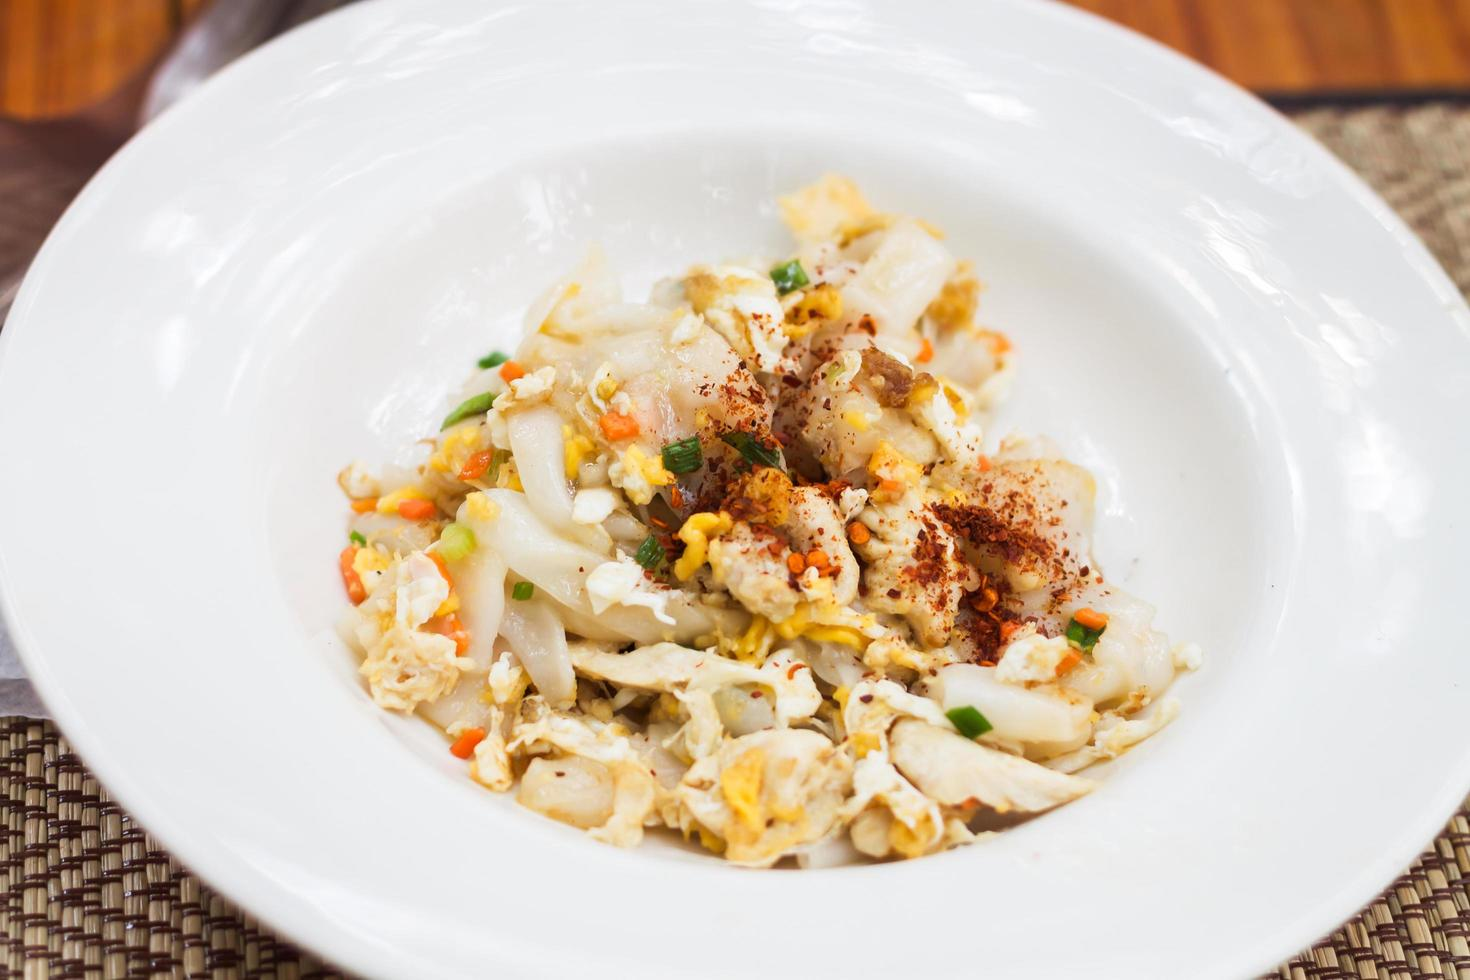 Close-up of fried noodles with shrimp photo